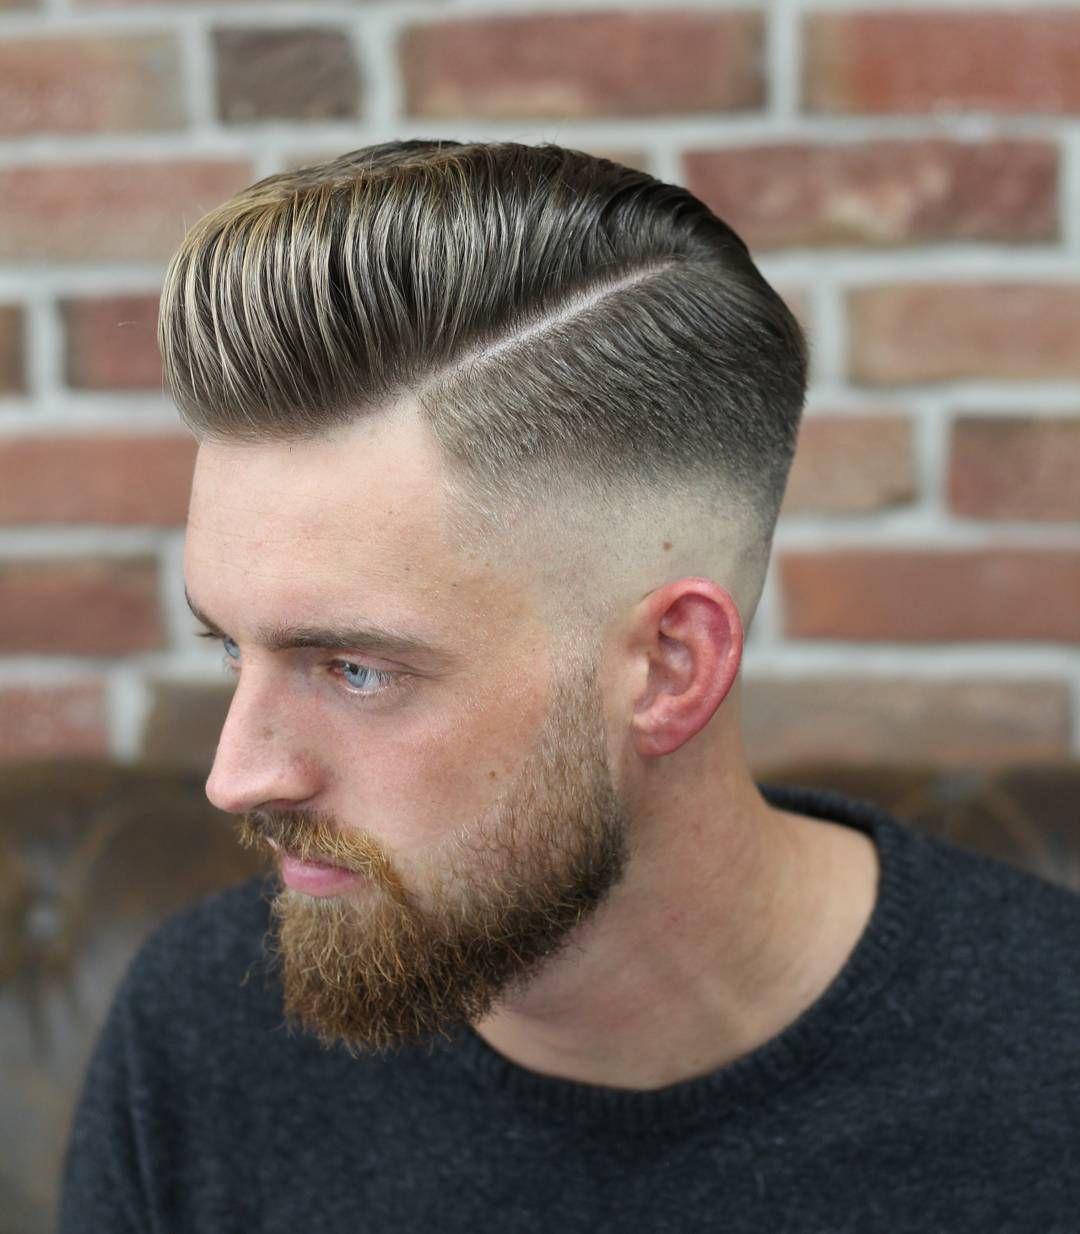 27 cool hairstyles for men | men's hair styles | cortes de